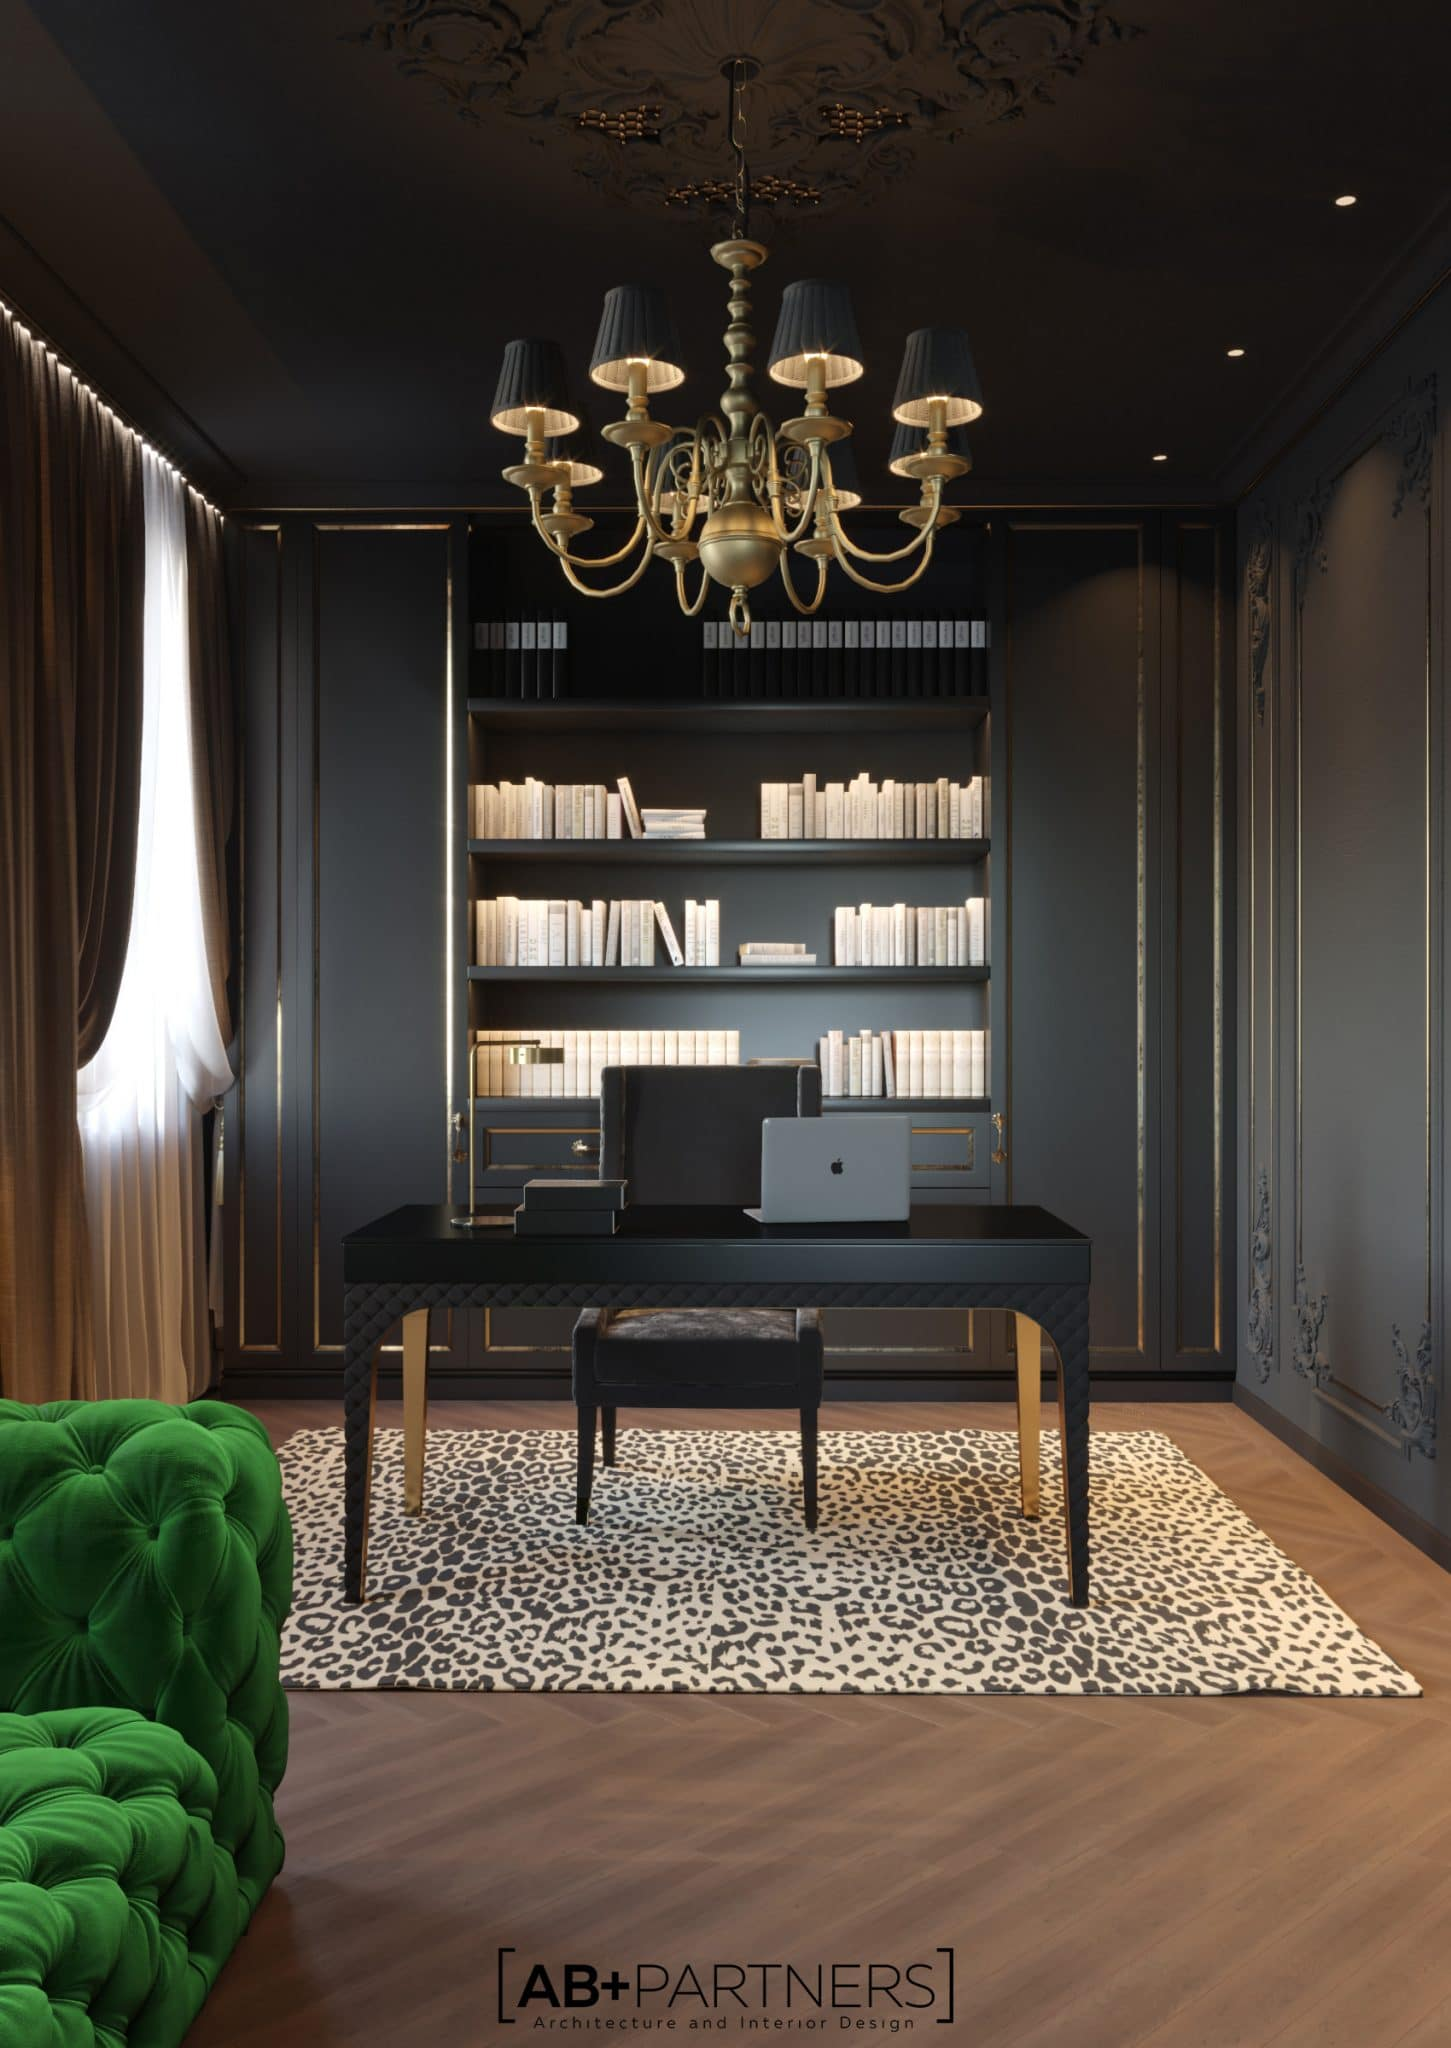 Design inetrior pentru camera de oficiu la villa de lux